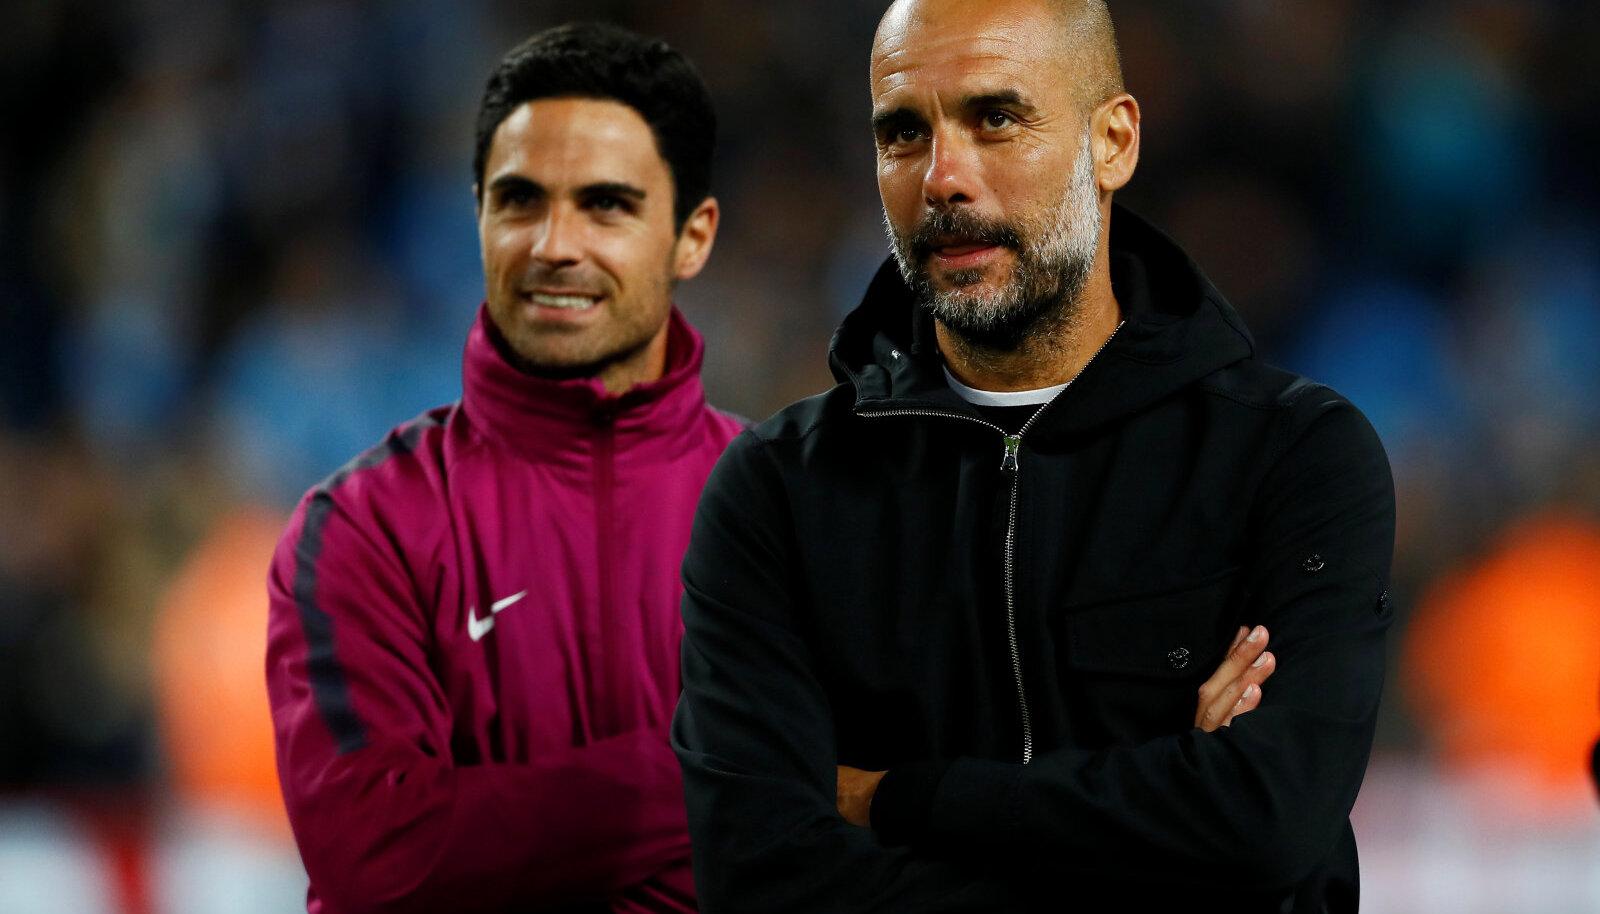 Mikel Arteta ja Pep Guardiola